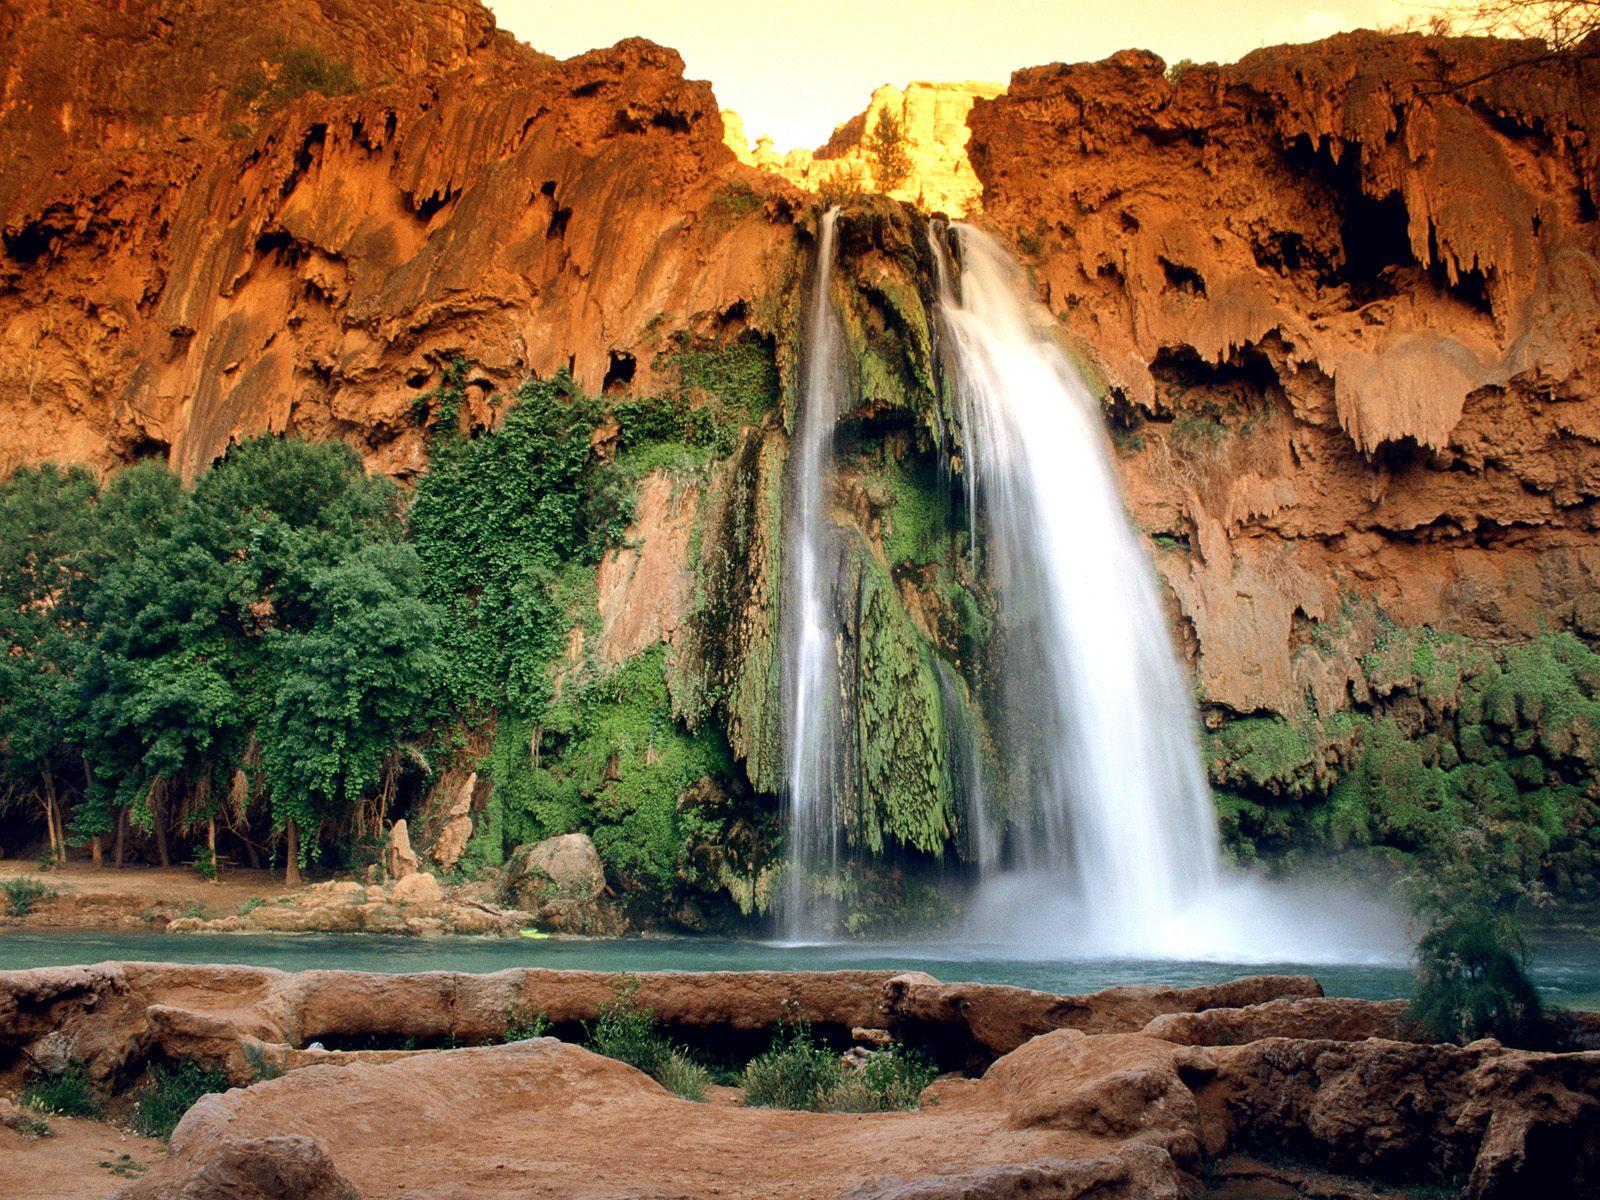 Waterfalls Wallpapers   Download Havasu Falls Arizona Wallpapers 1600x1200